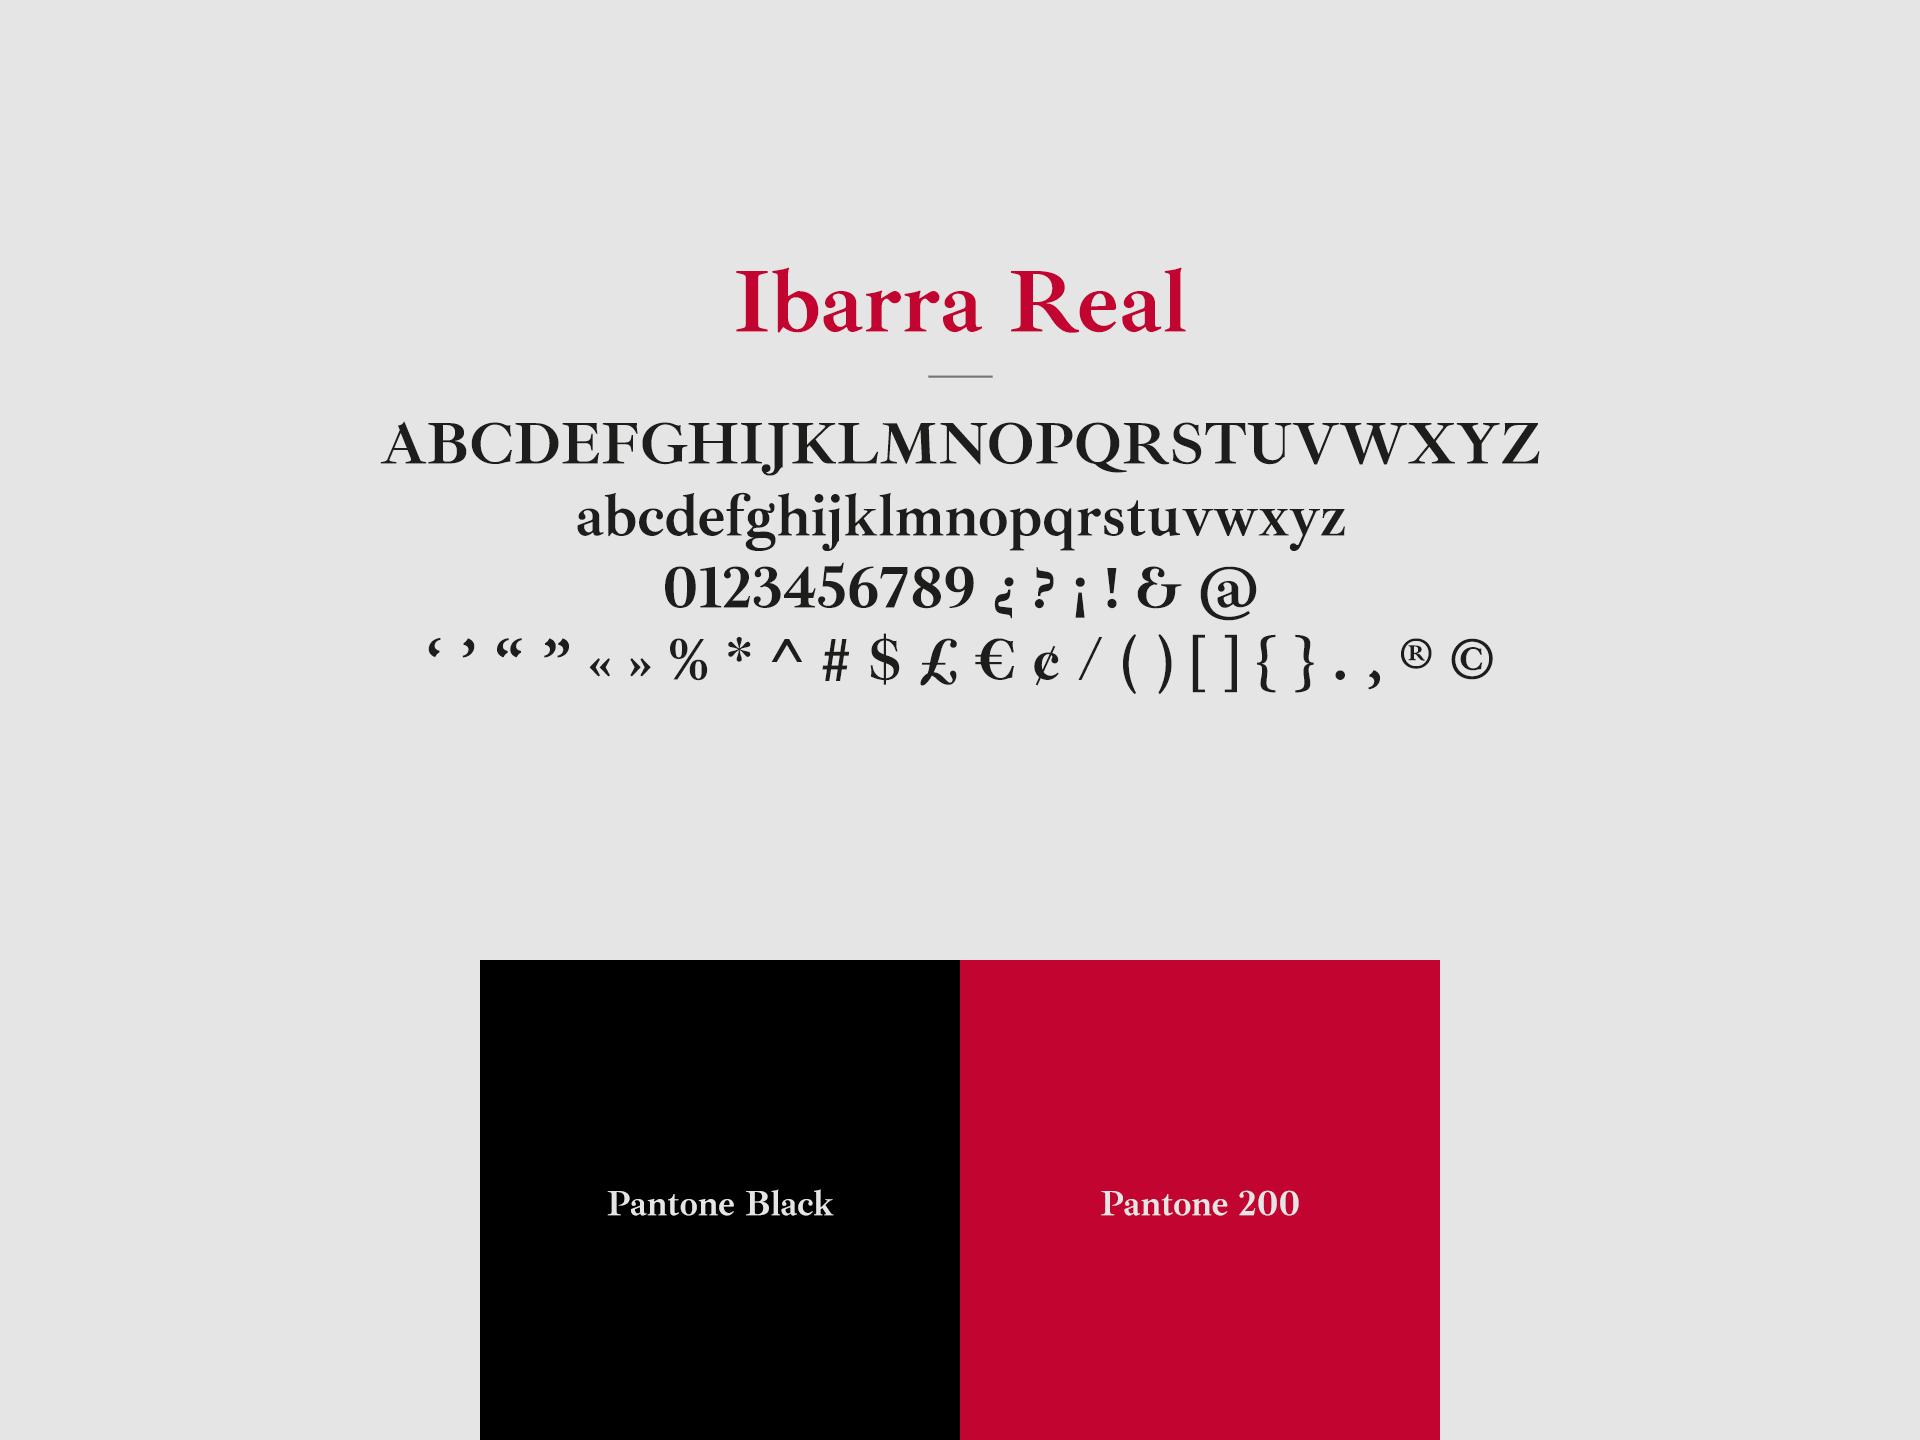 tipografia fabiana sanna Ibarra real